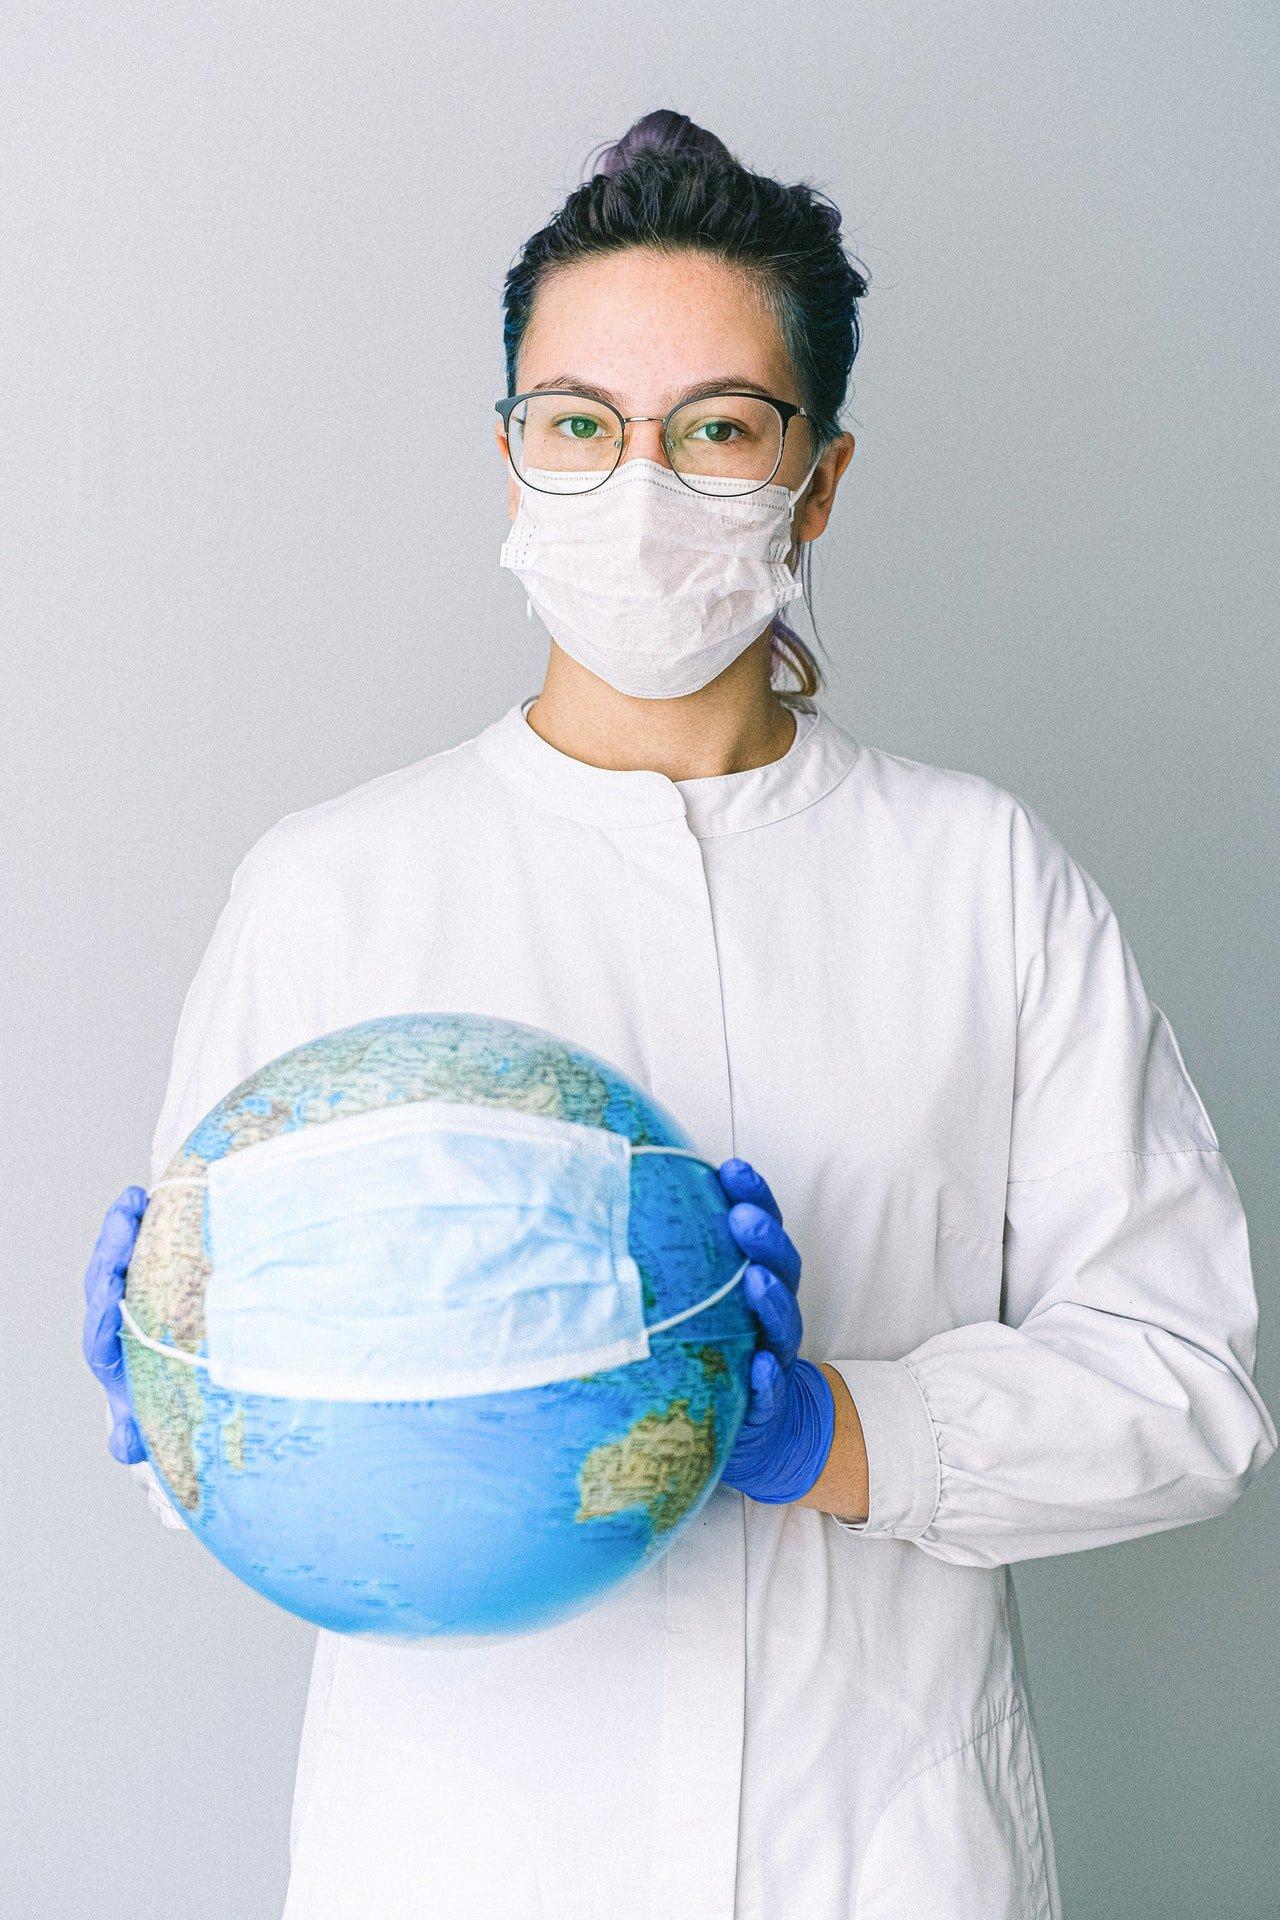 nurse with globe